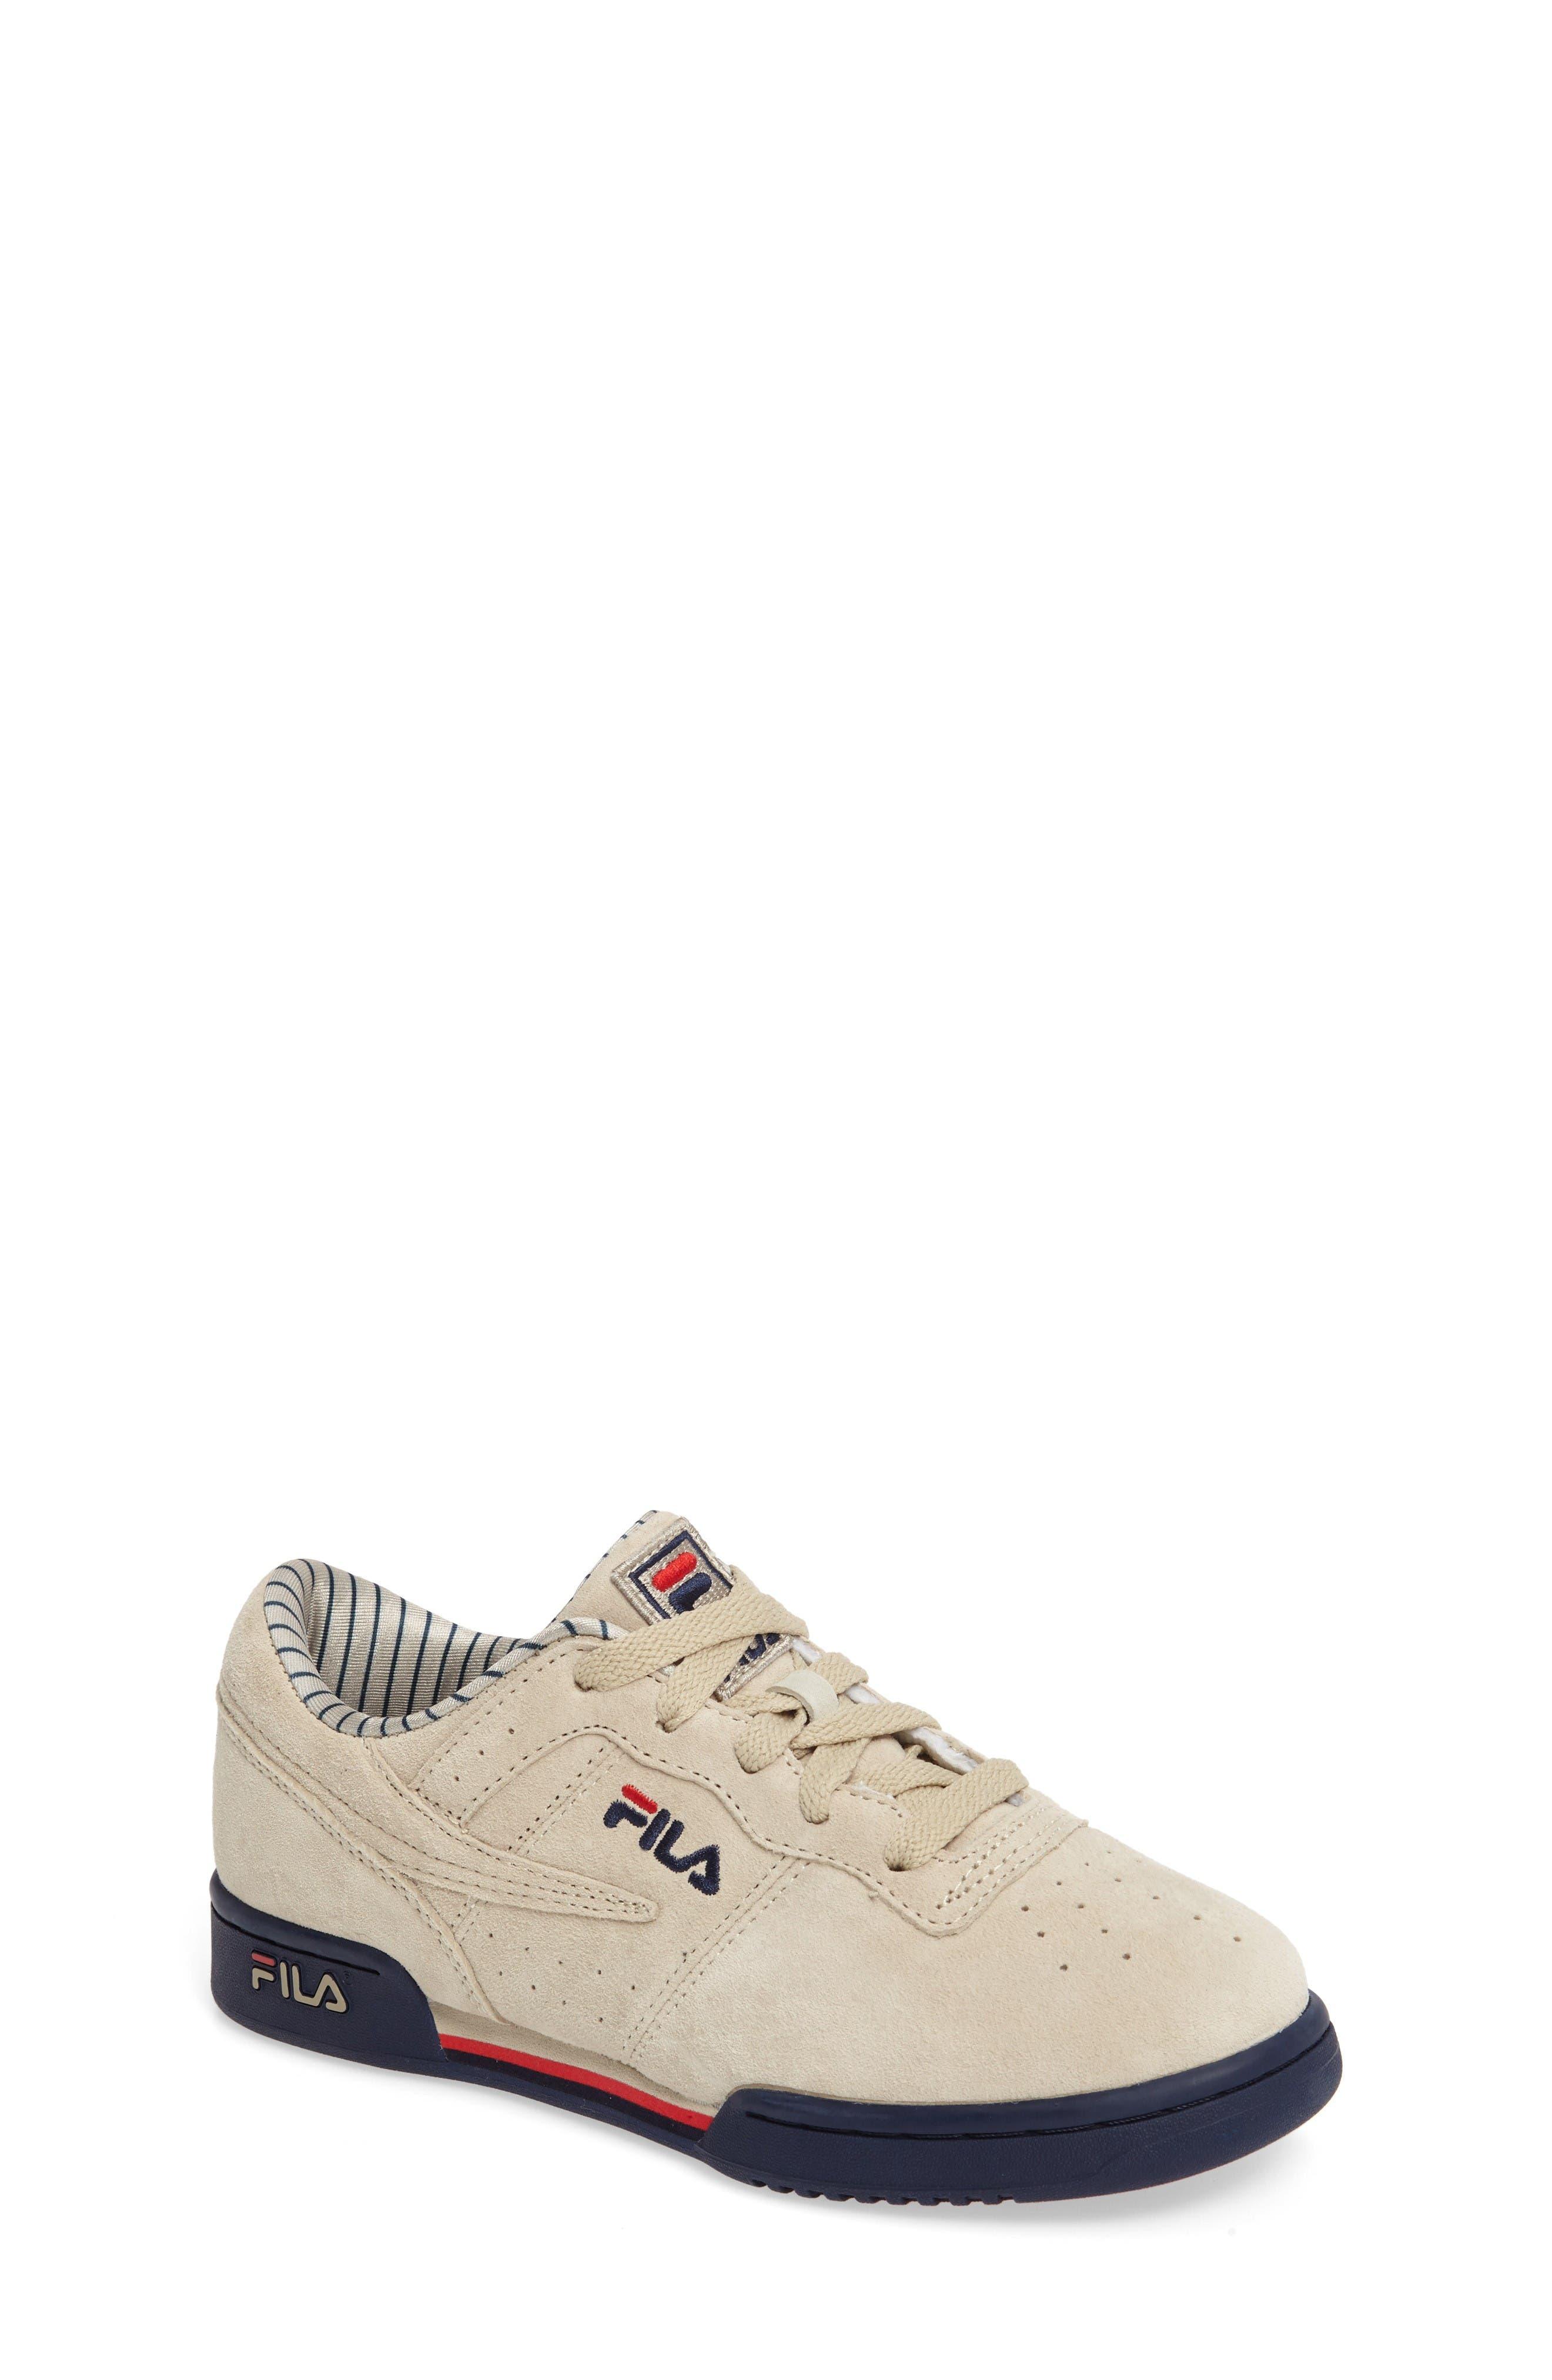 Fila Original Fitness Sneaker (Big Kid)